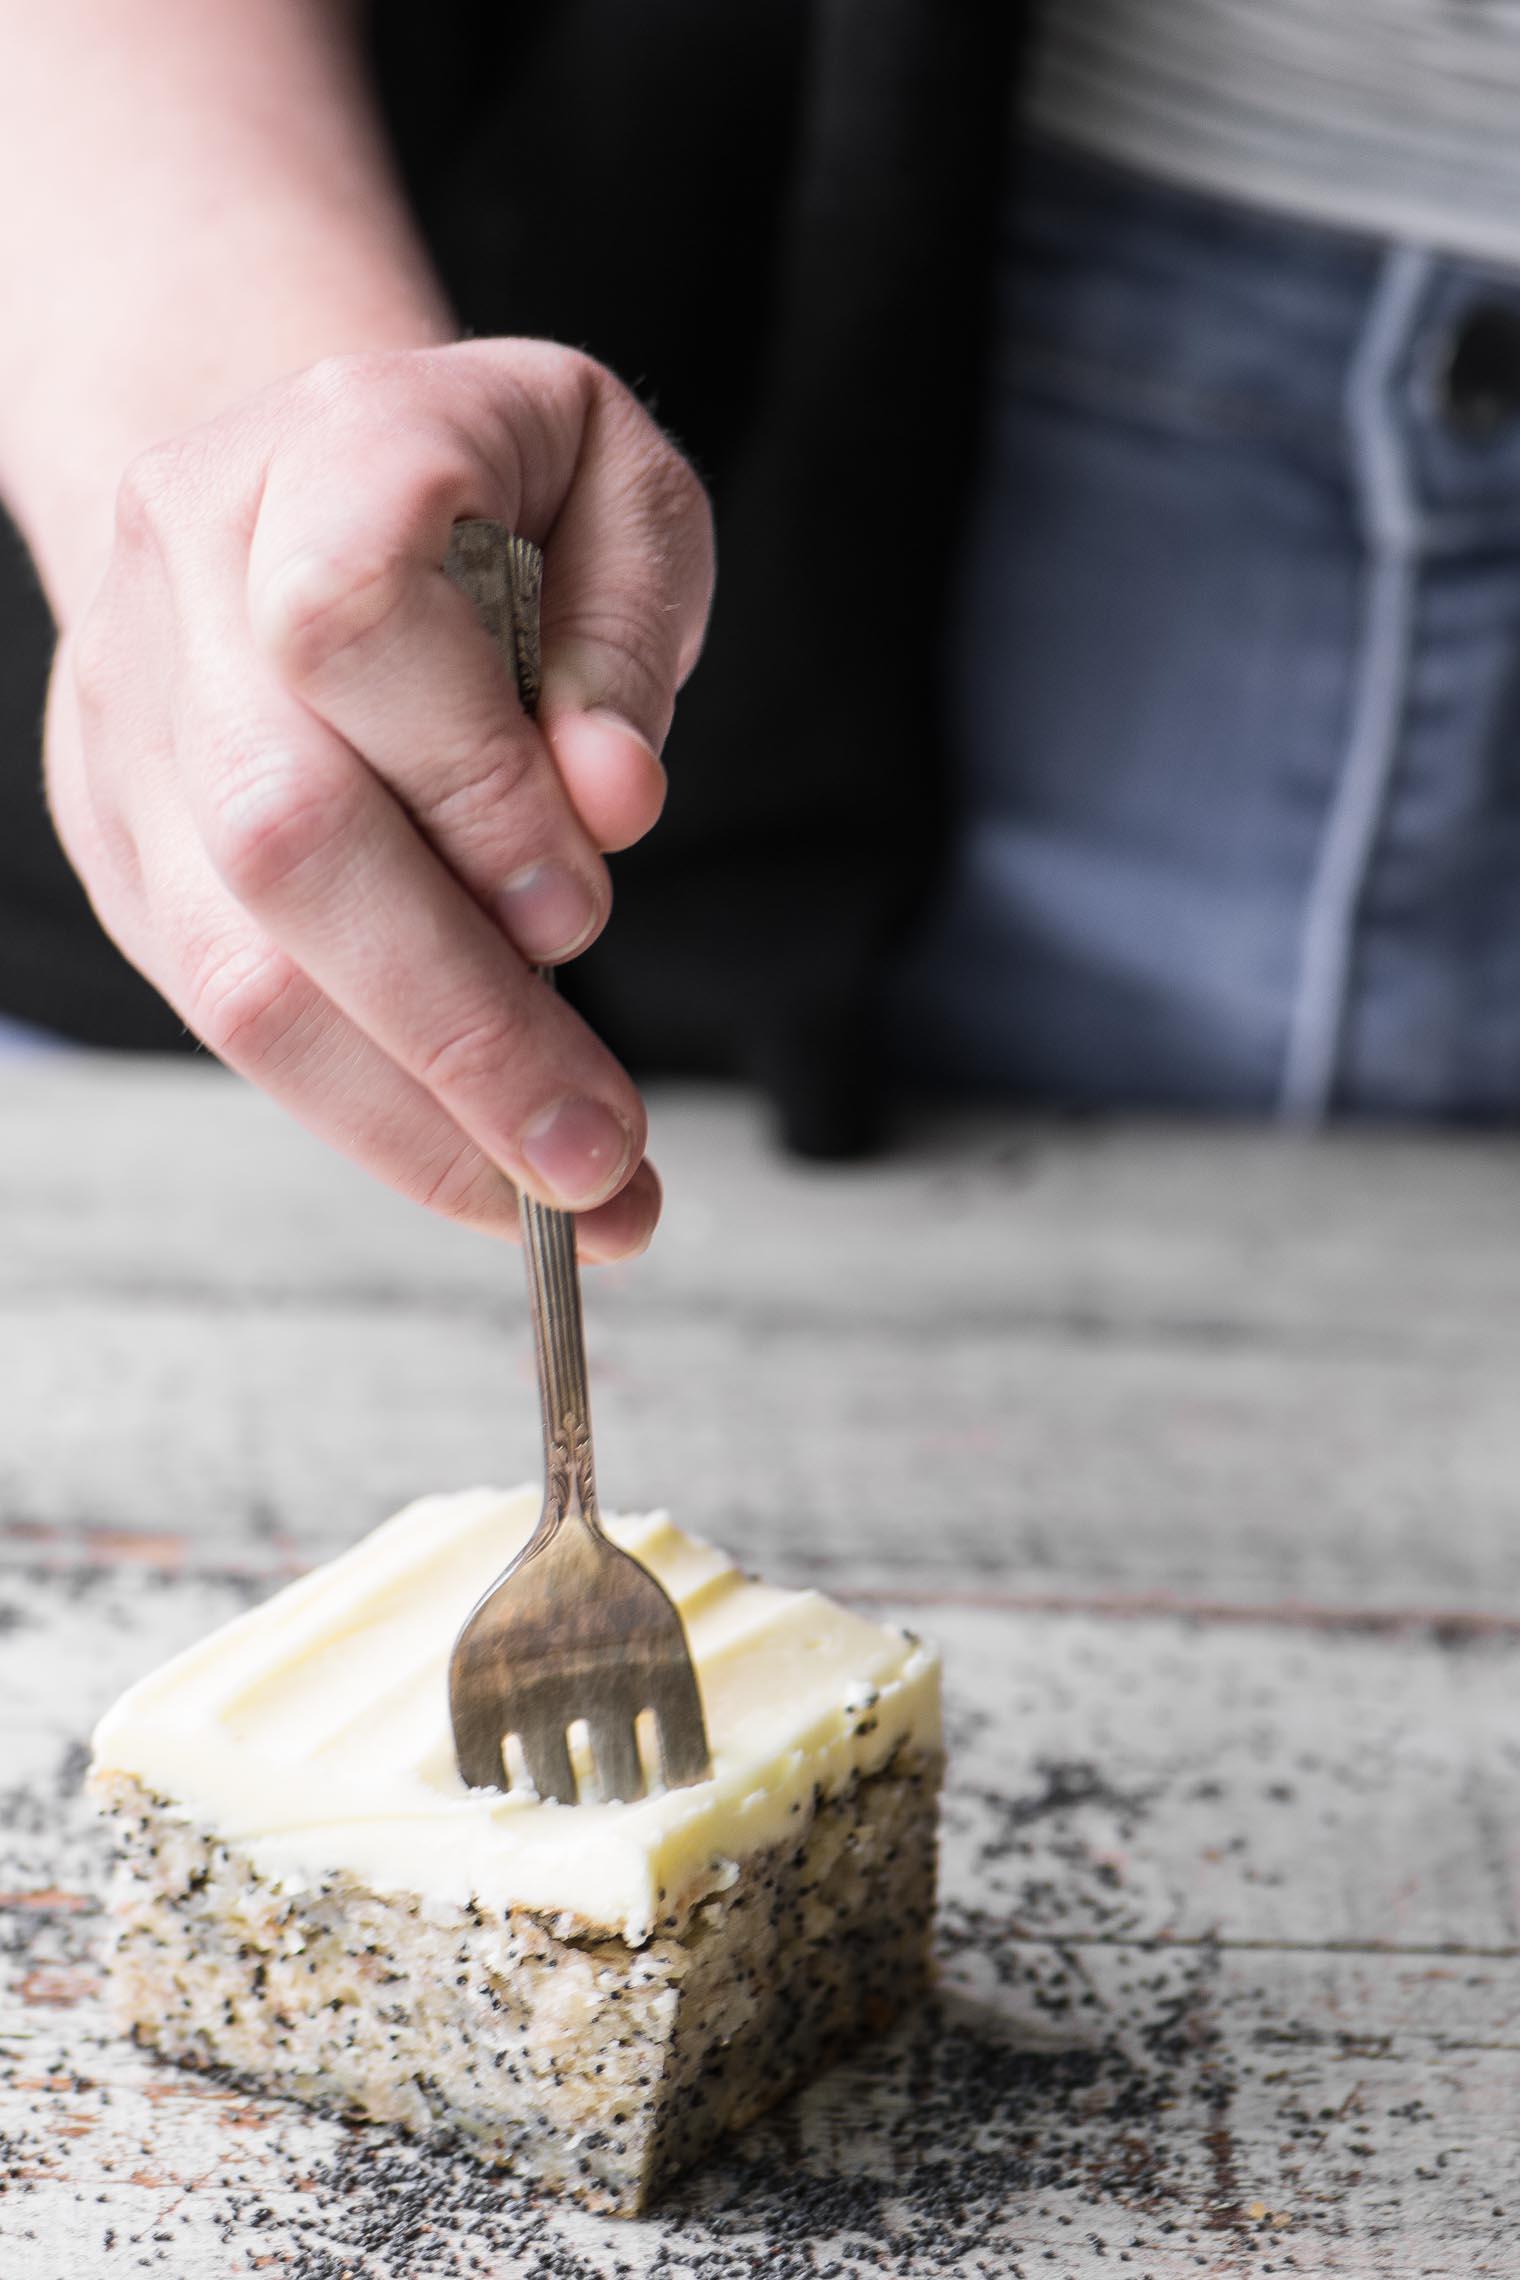 Banana Poppy Seed Cake with Lemon Buttercream on a wooden table